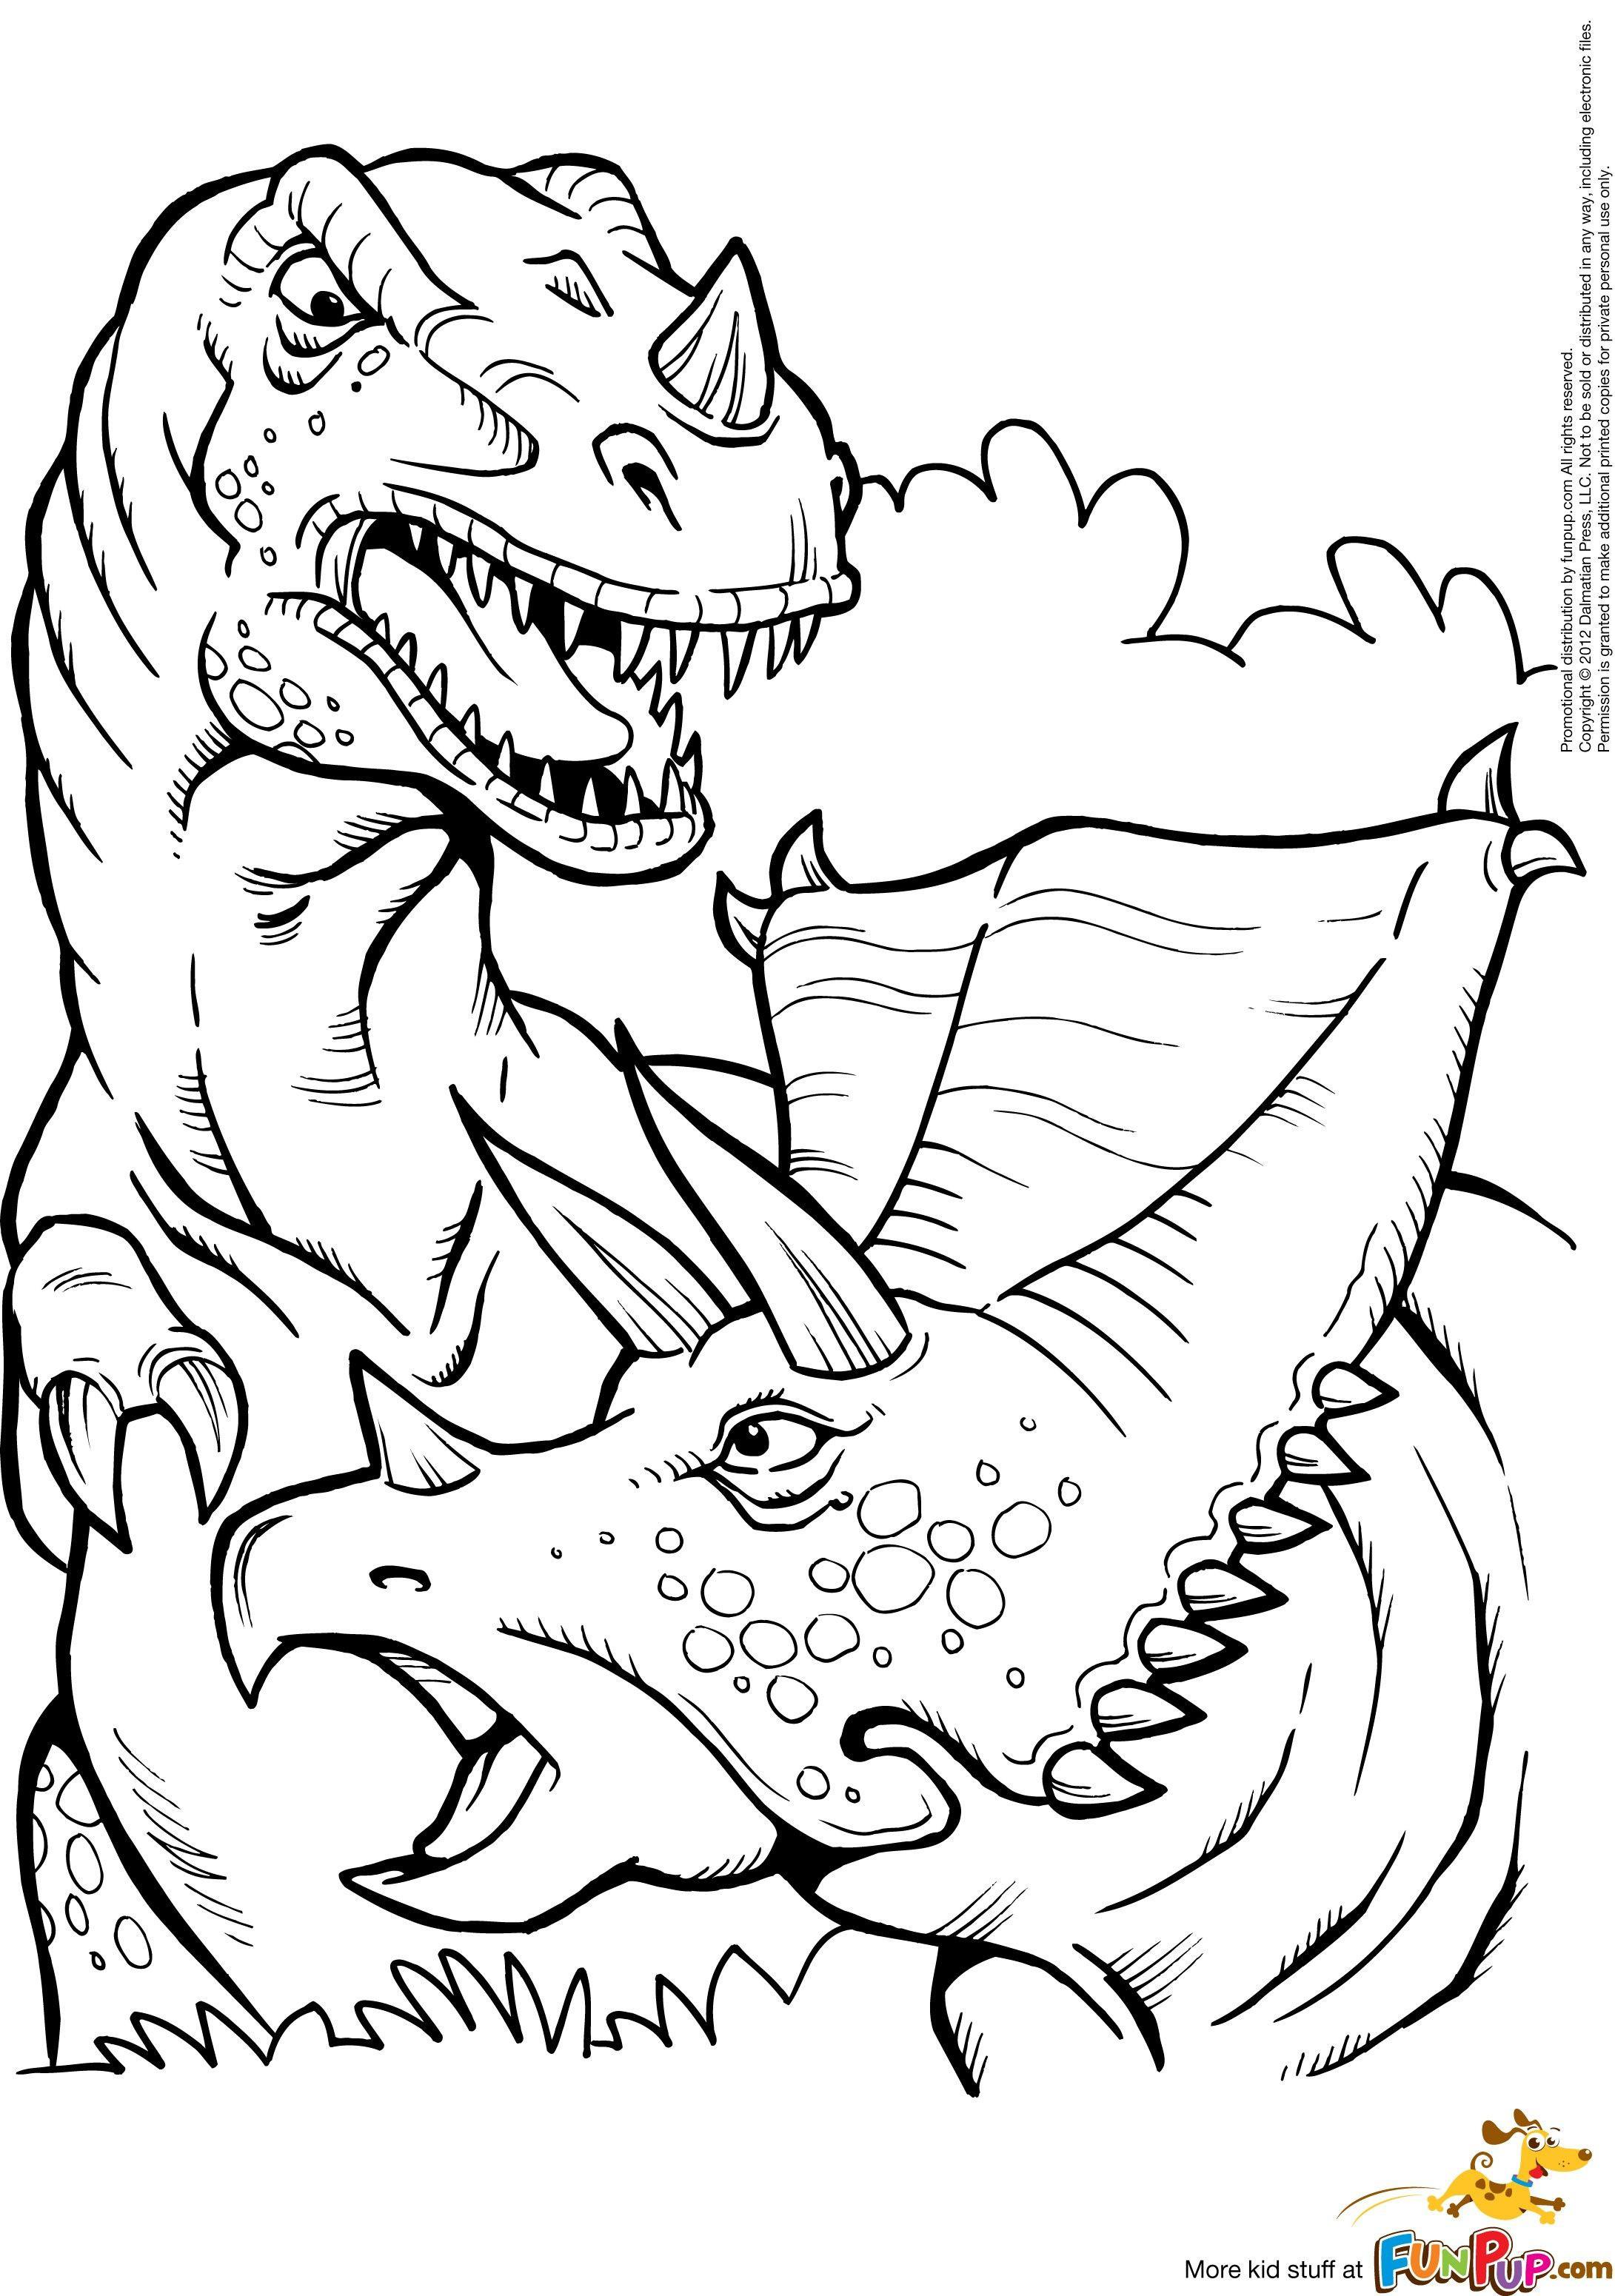 Ausmalbild T-rex Neu 35 T Rex Ausmalbilder Scoredatscore Einzigartig Dinosaurier Rex Bild